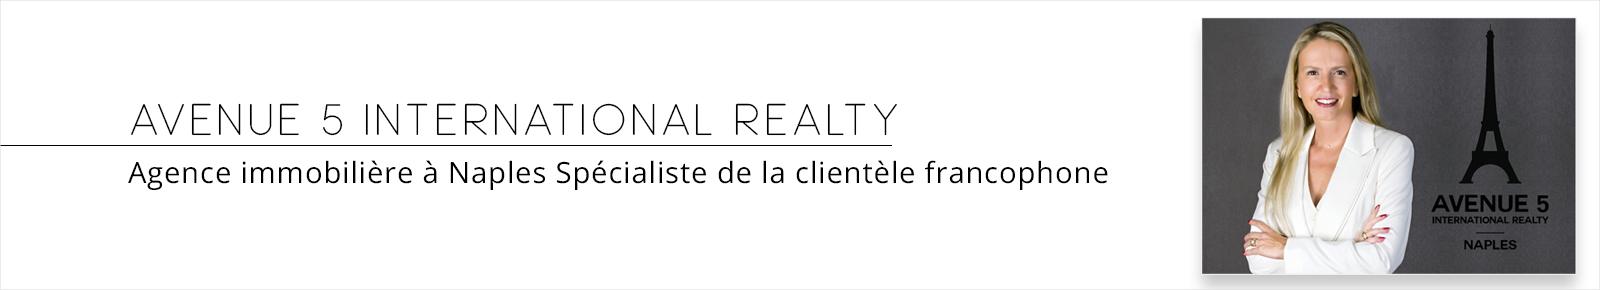 Avenue 5 International Realty